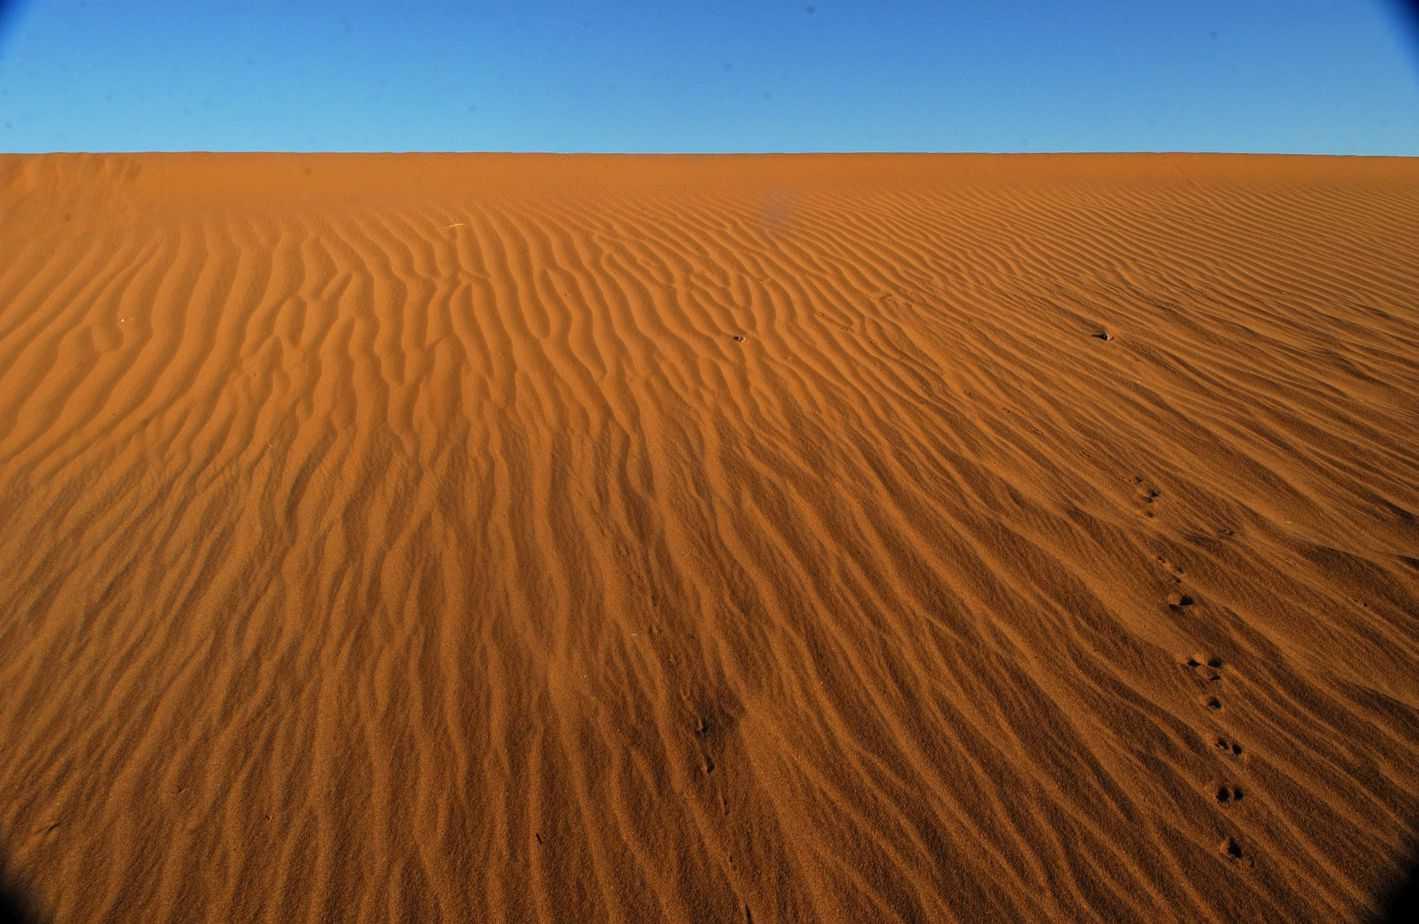 Top 10 fascinating facts about Sahara desert